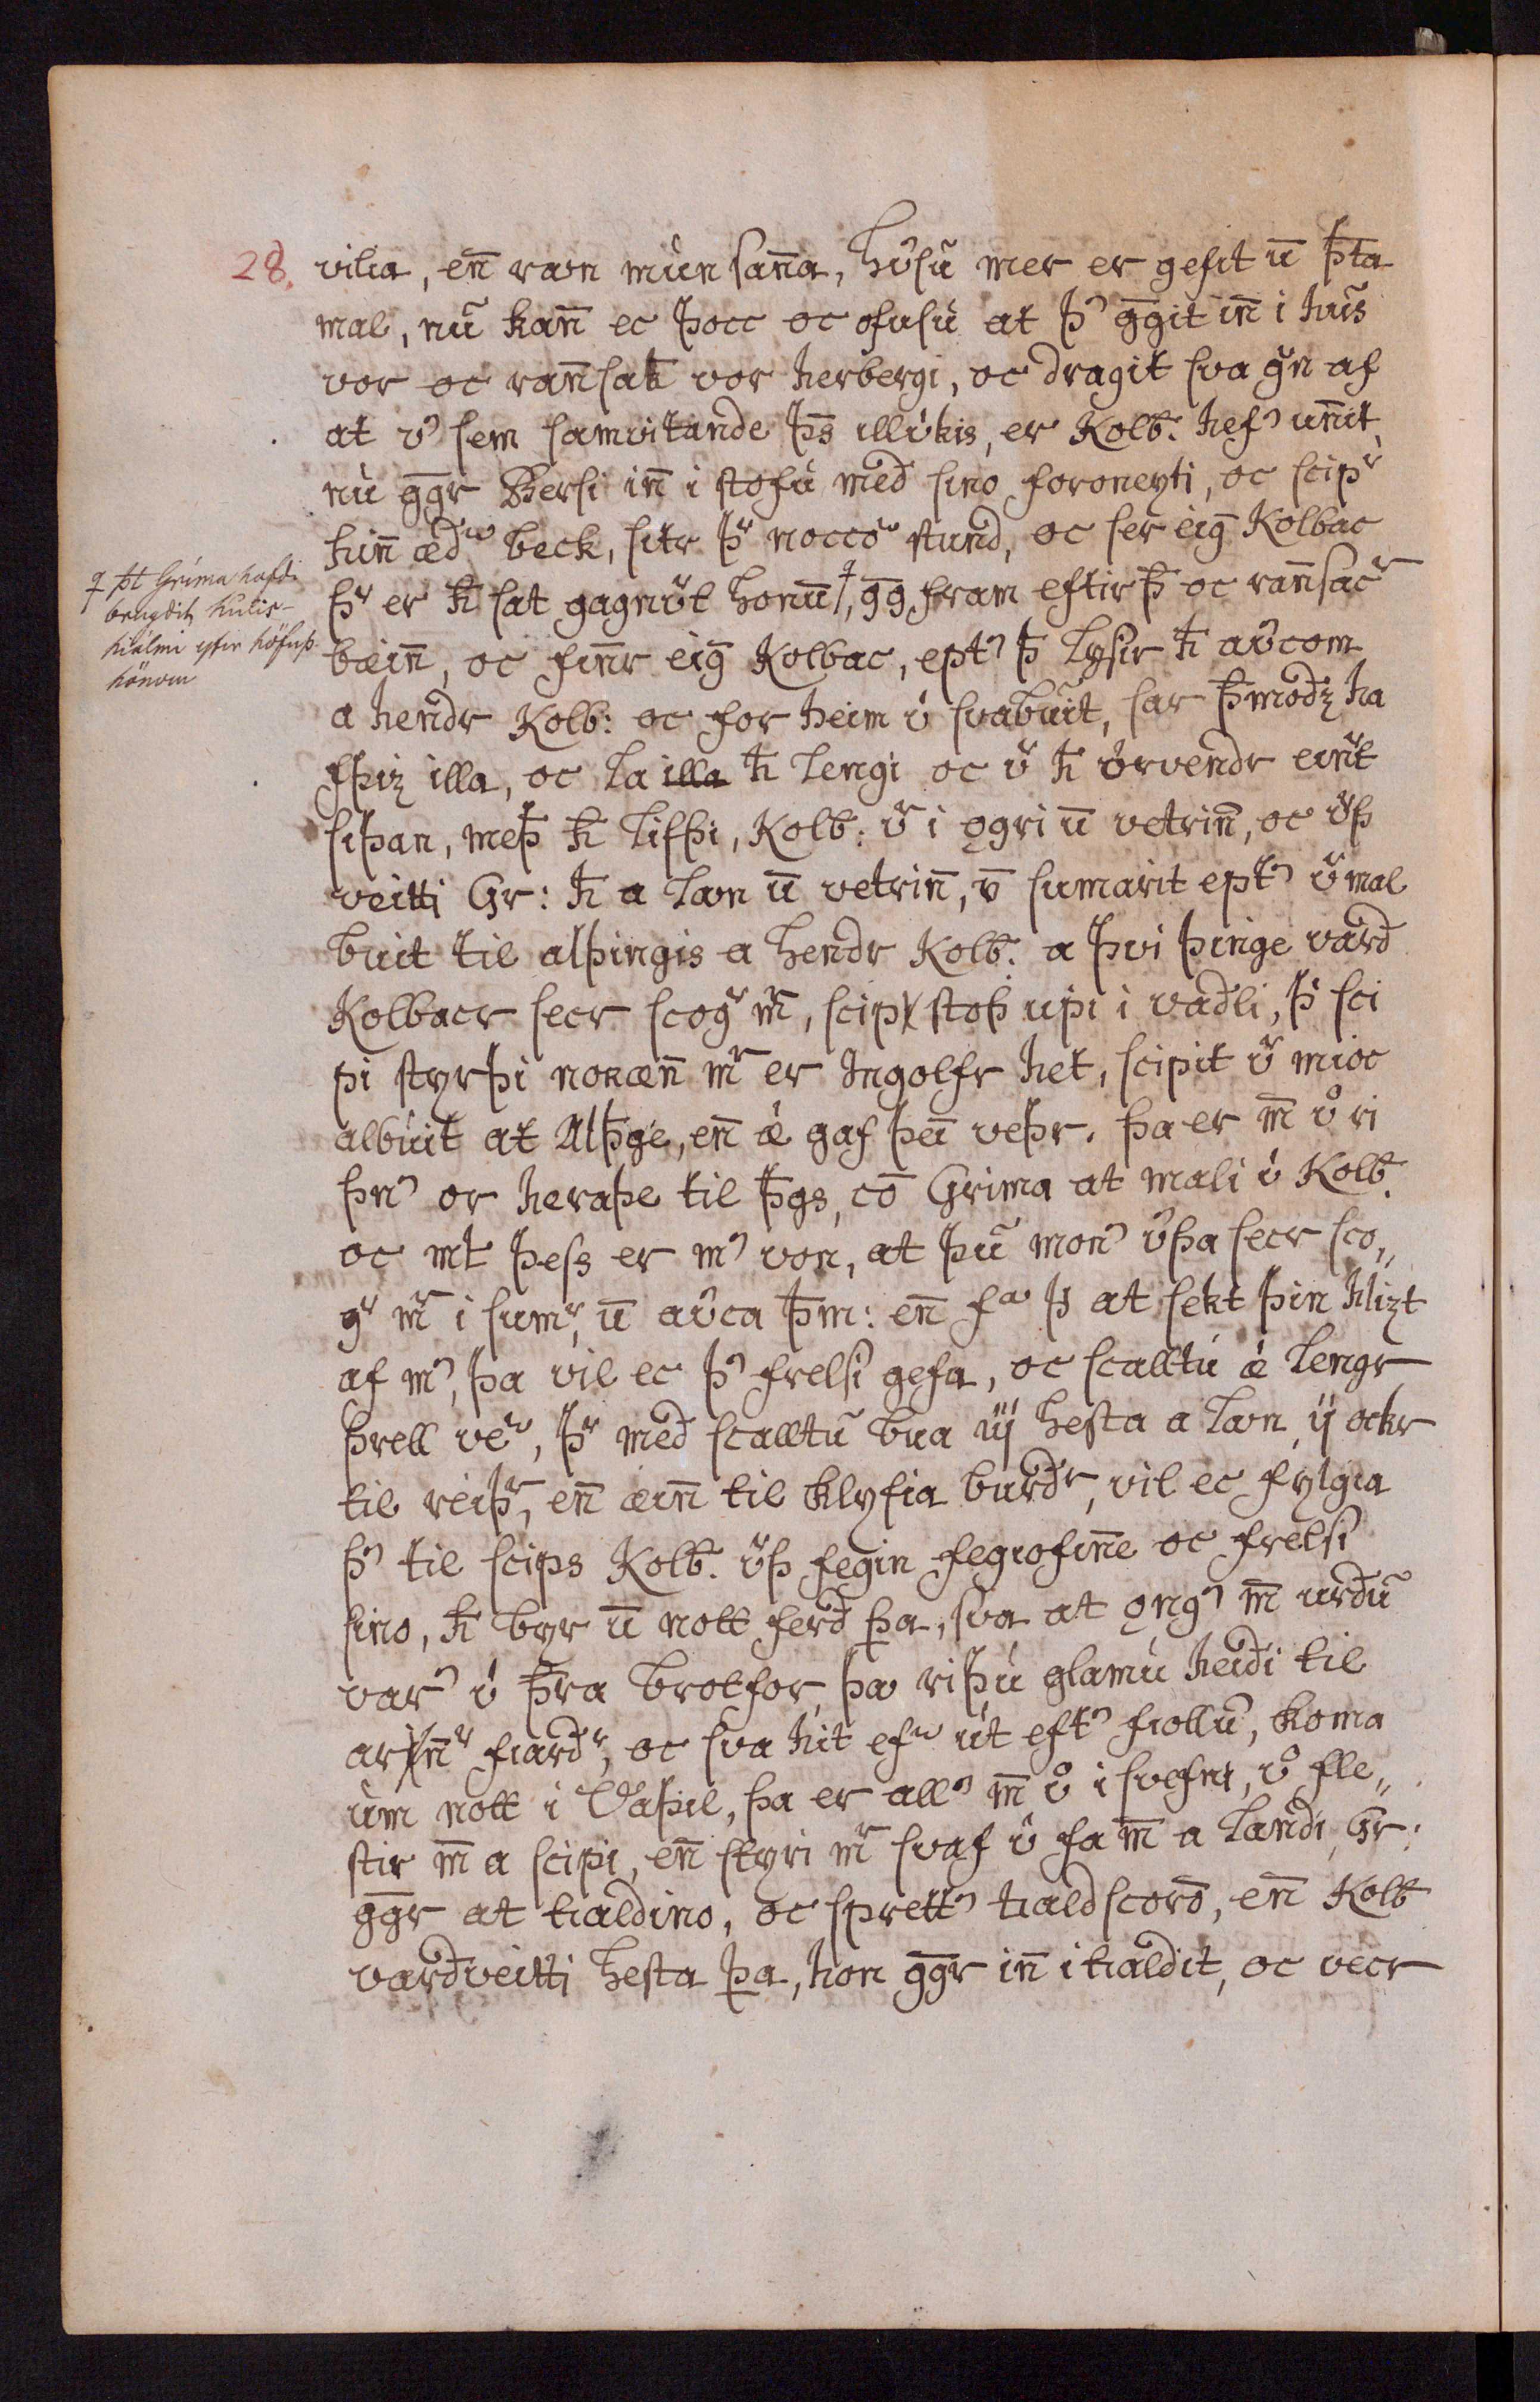 AM 141 fol - 14v